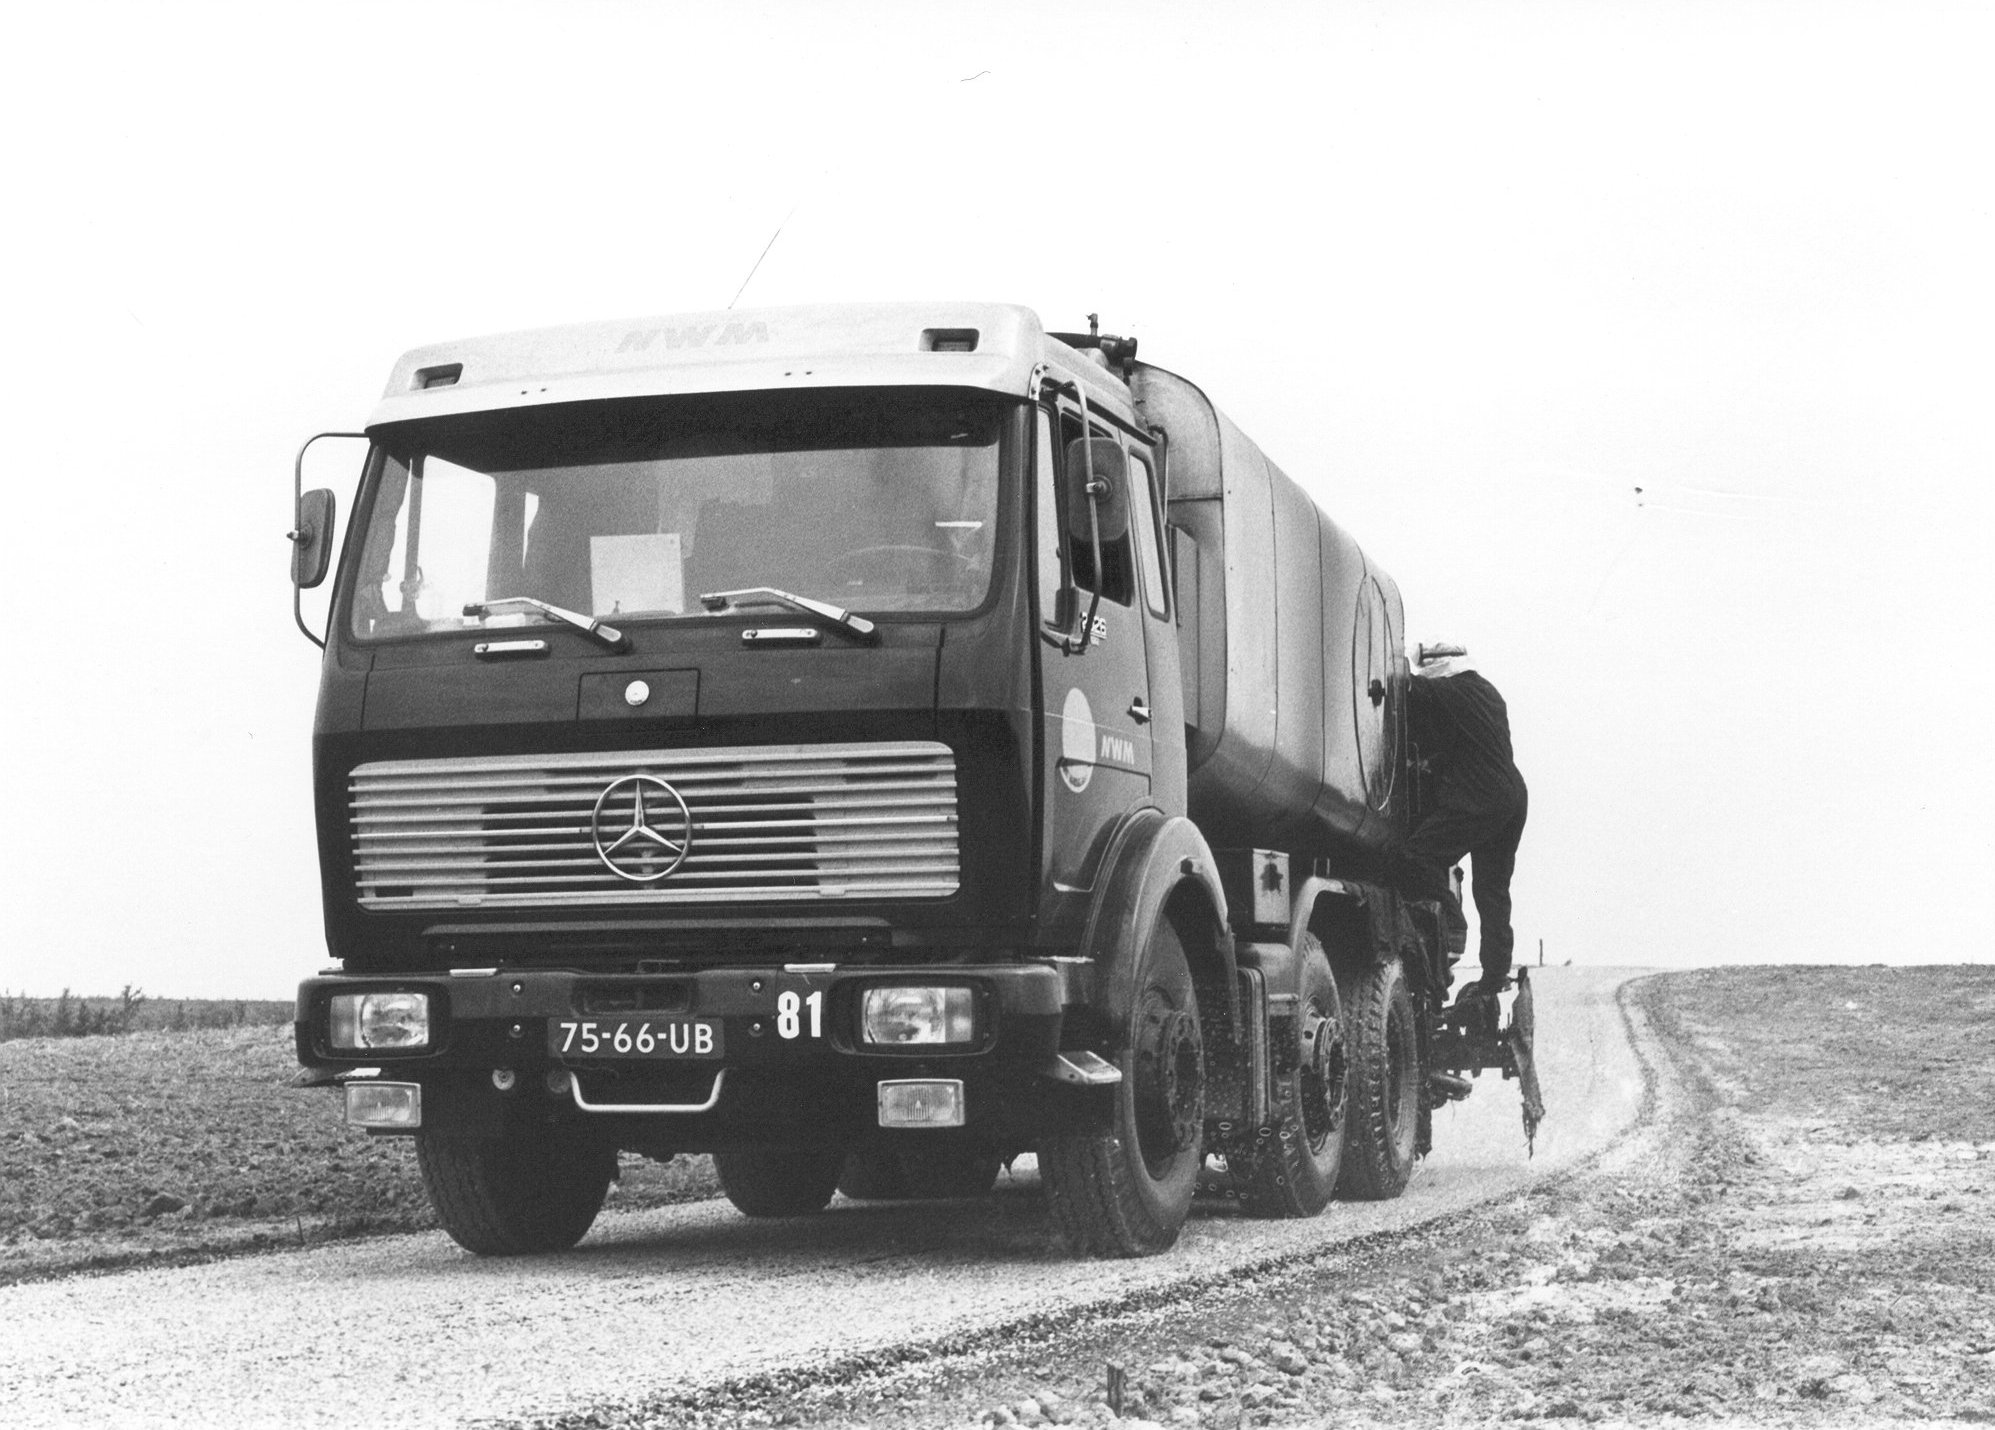 M81-15